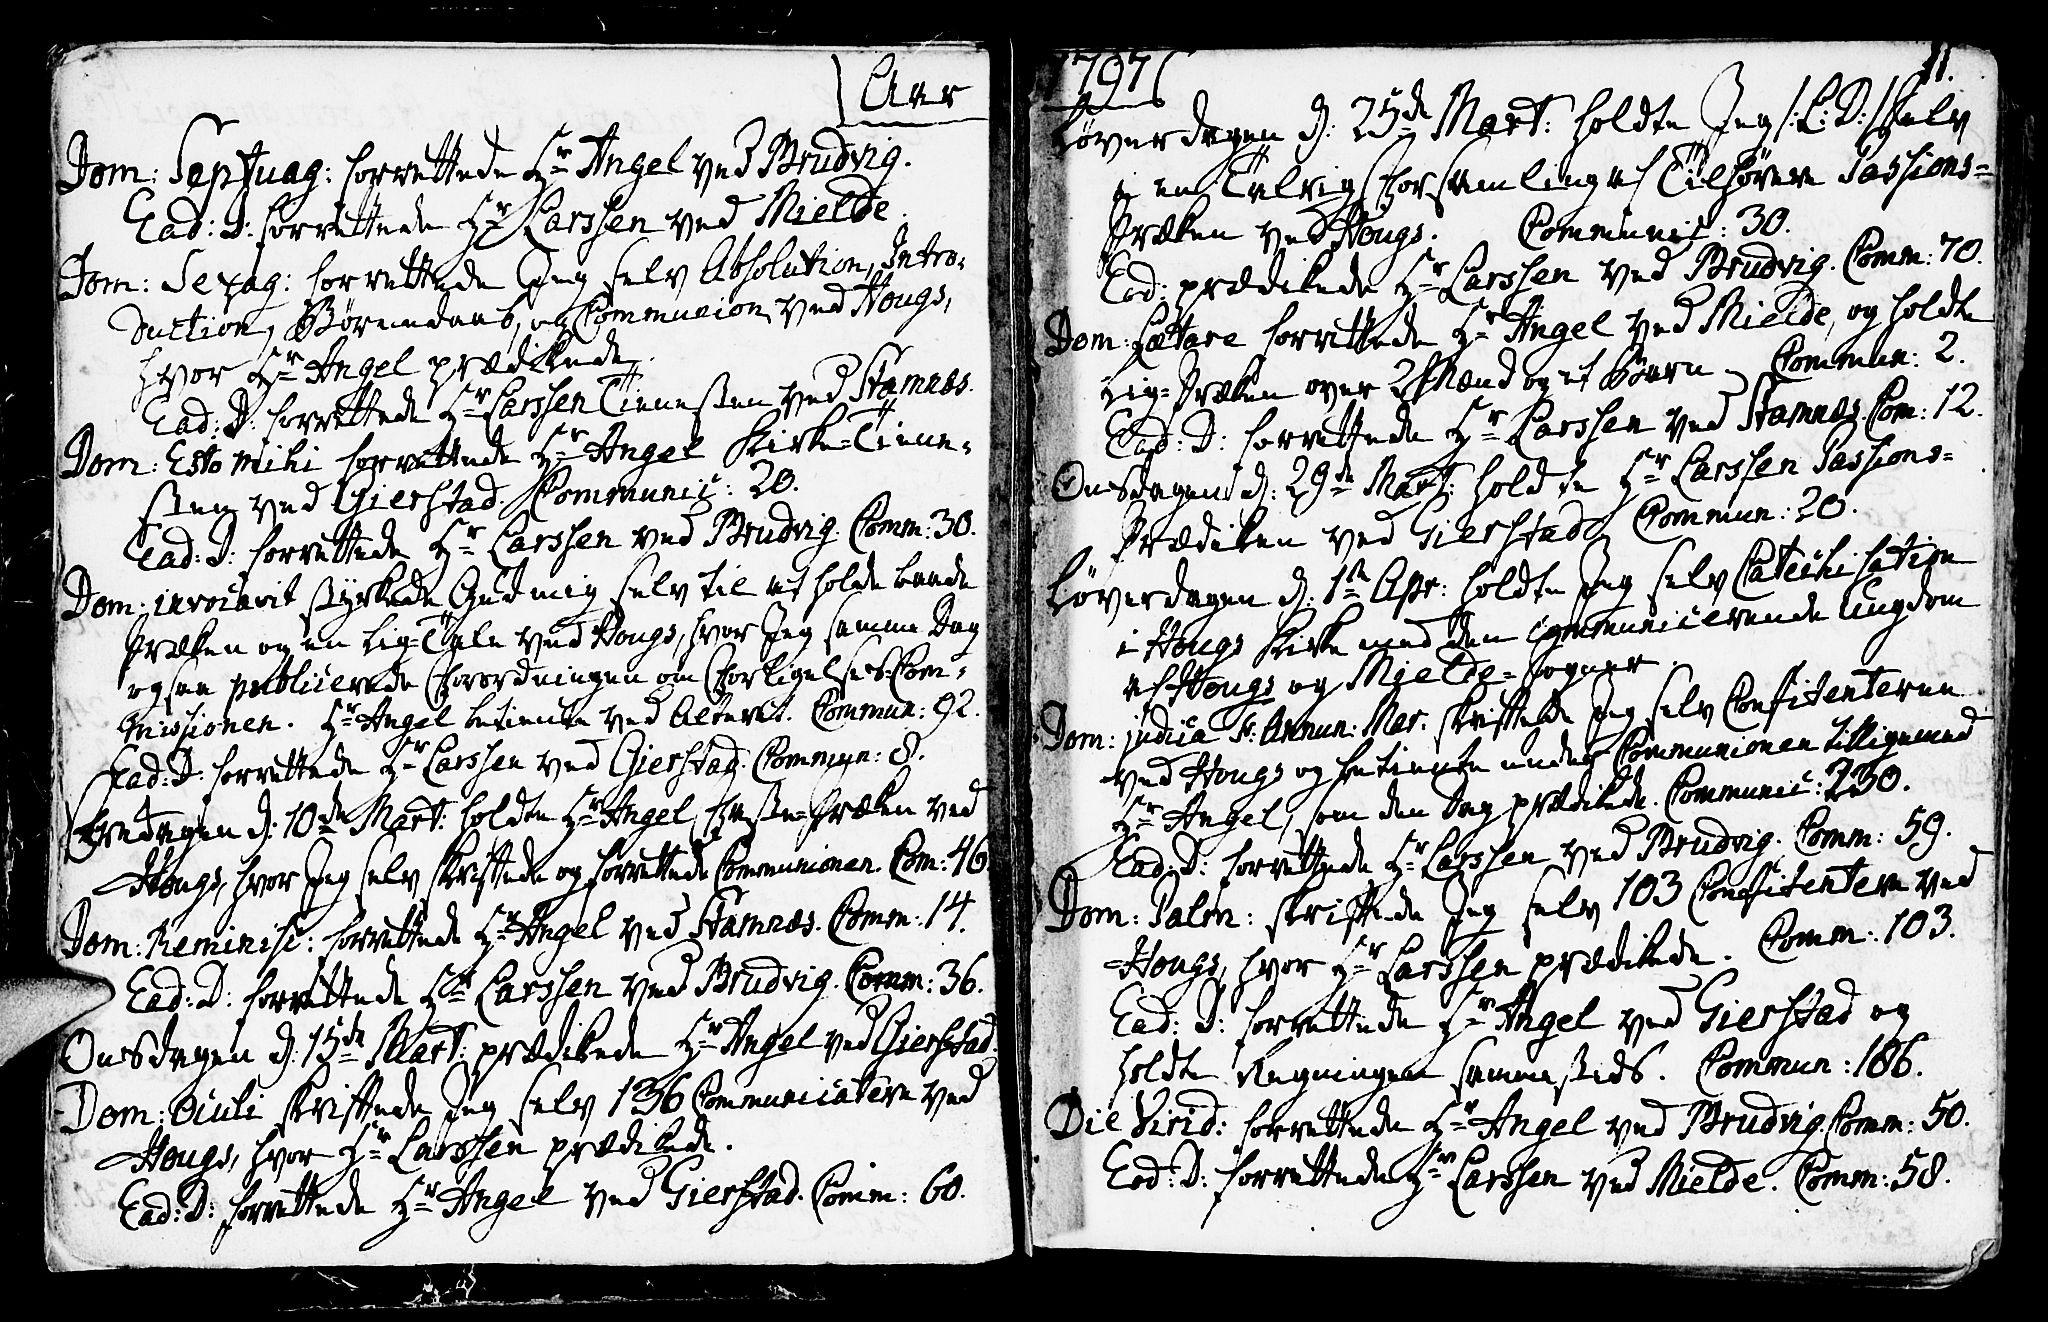 SAB, Haus sokneprestembete, H/Haa: Ministerialbok nr. A 11, 1796-1816, s. 11